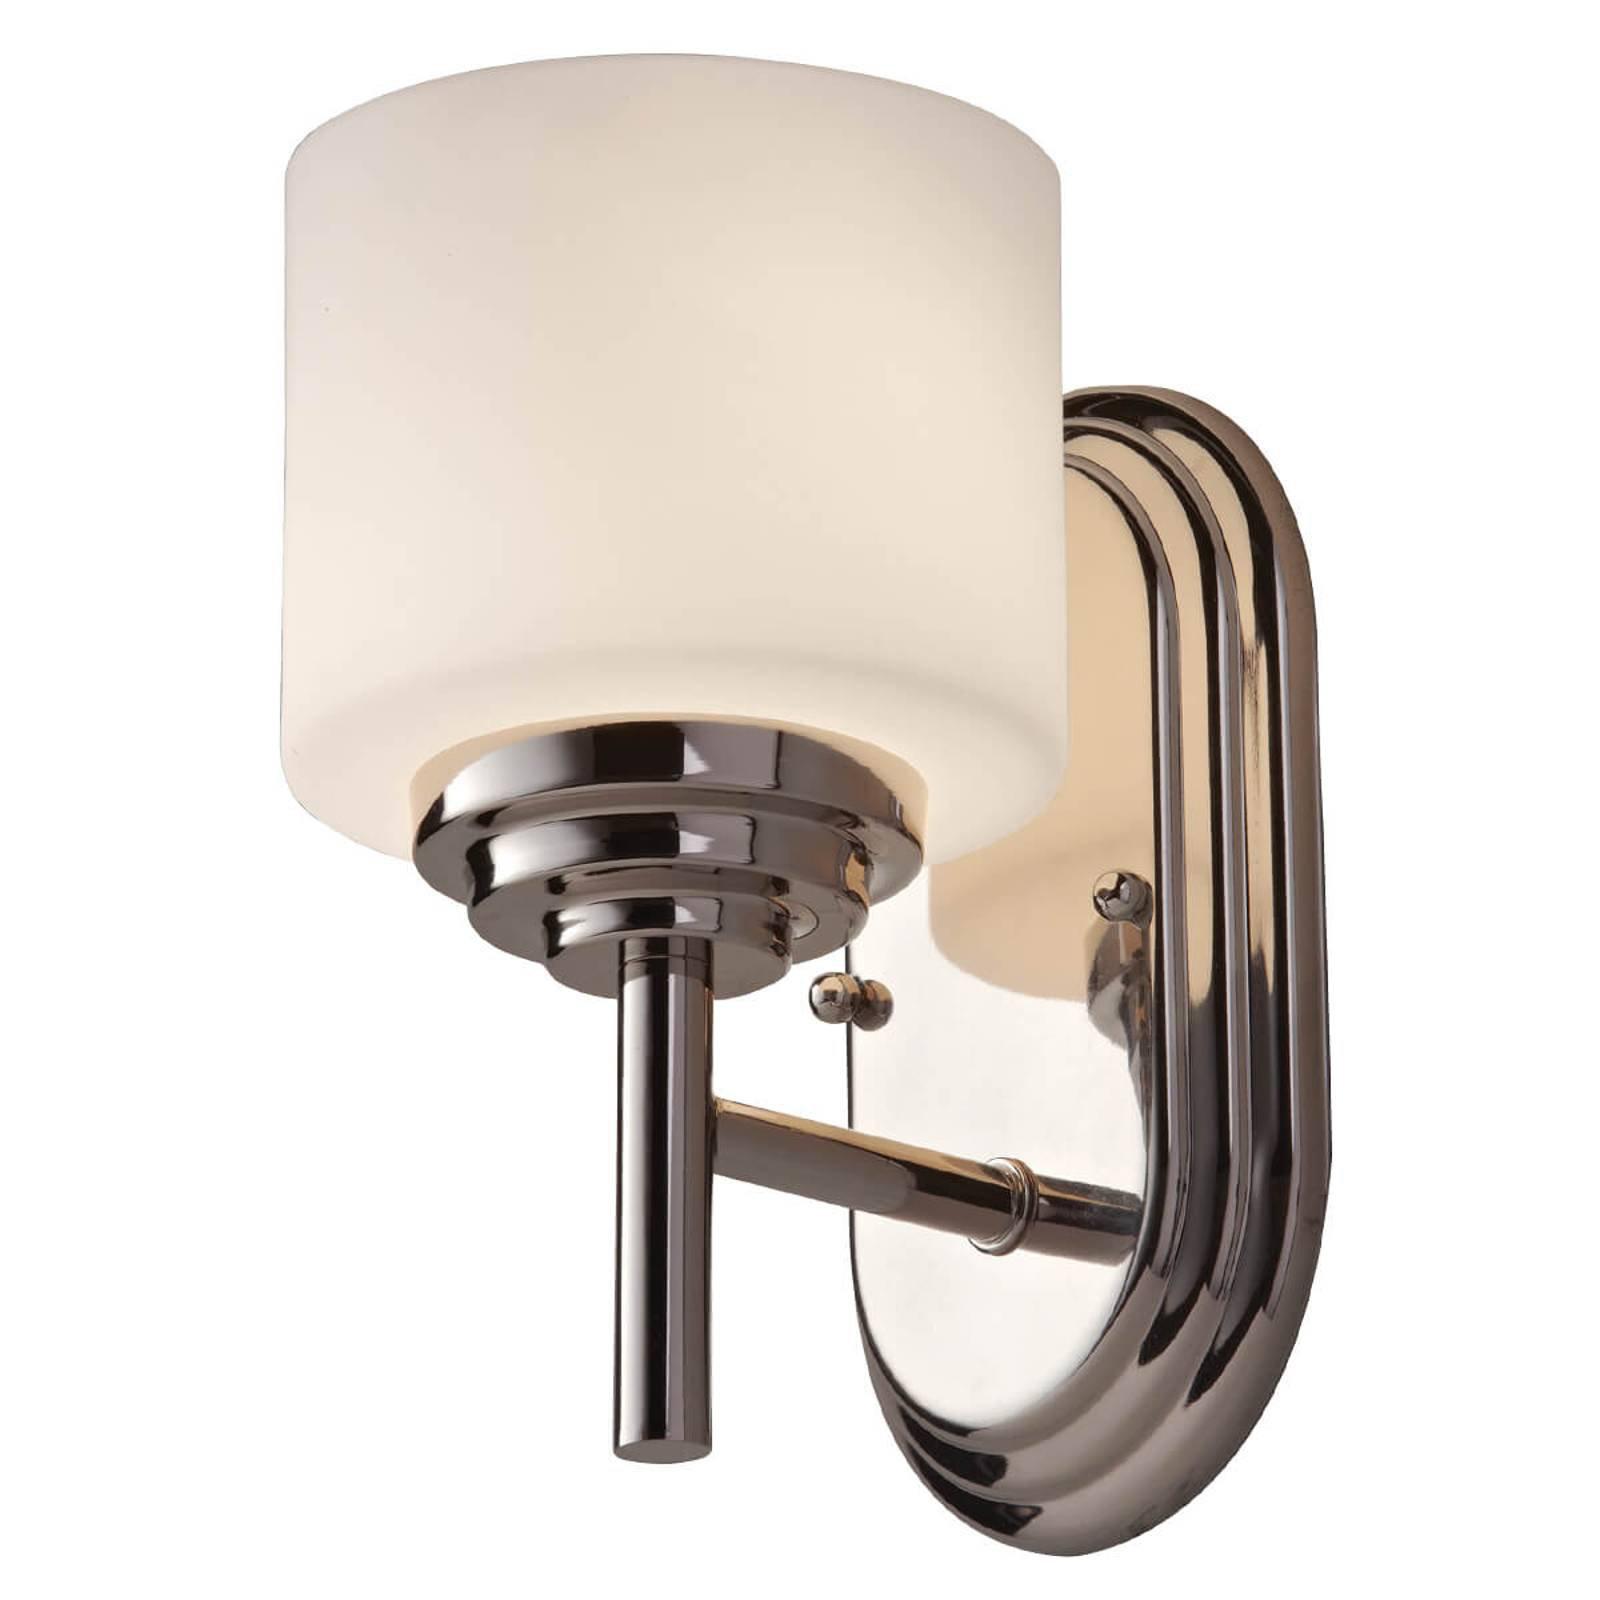 Vegglampe til bad Malibu